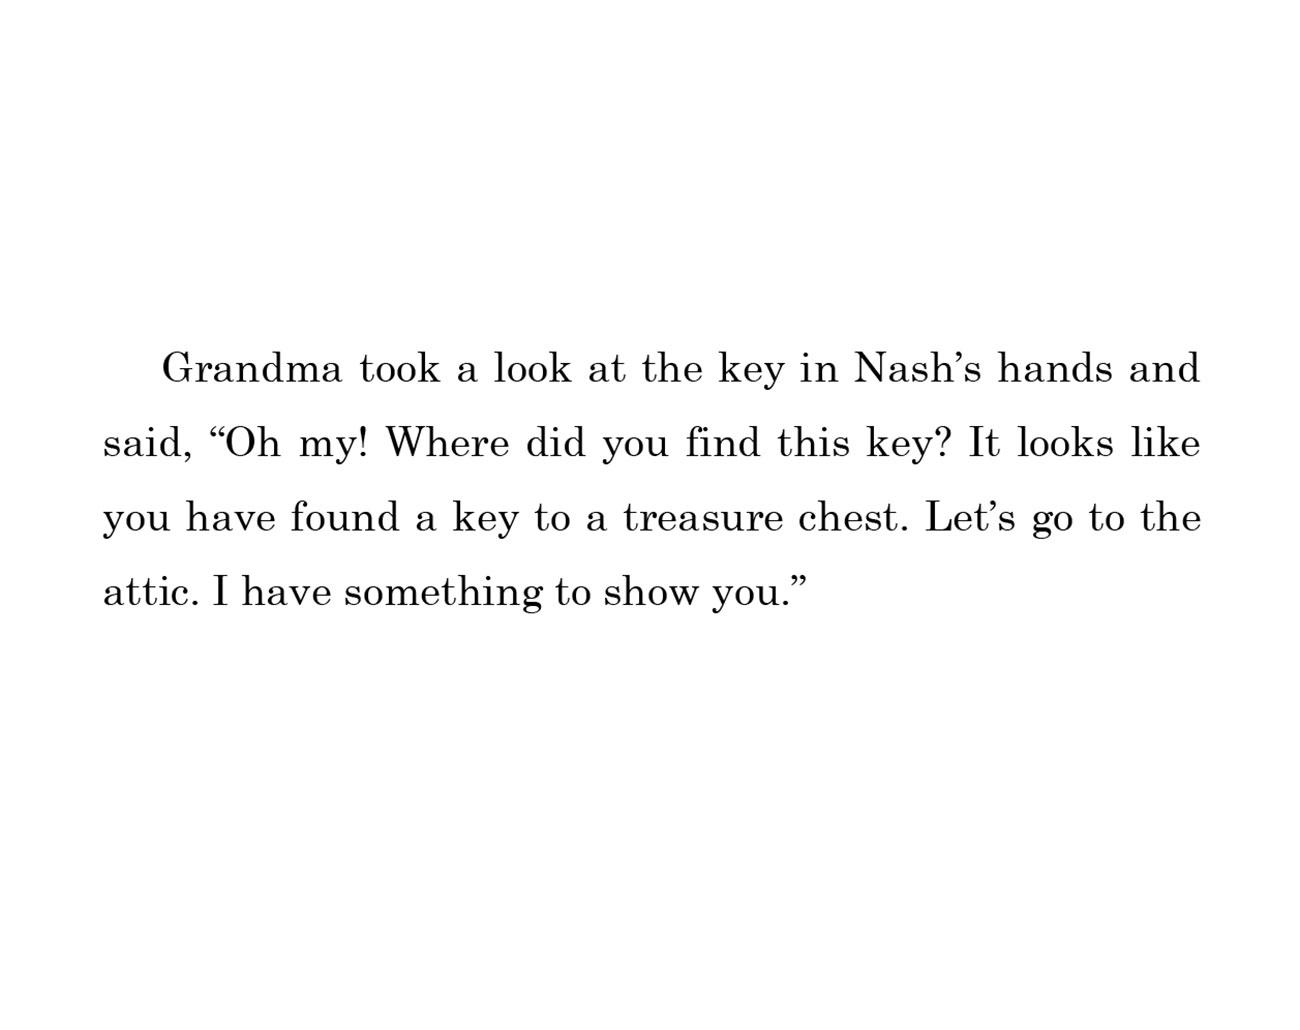 kids short story 'Down the memory lane with nash' by uma bala devarakonda - page 8